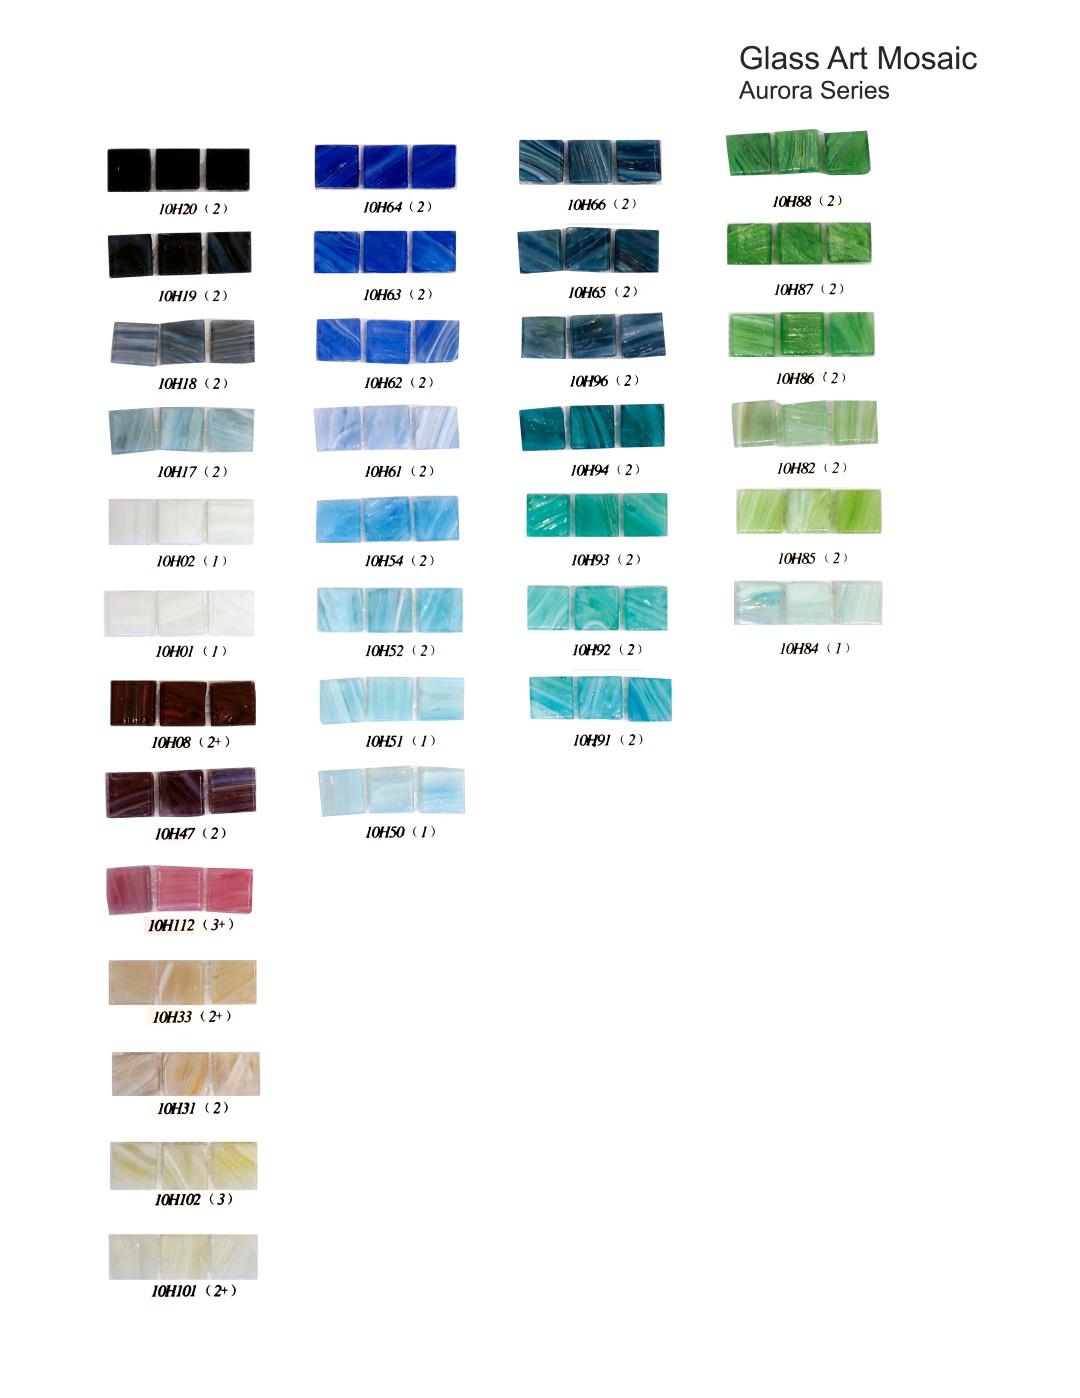 Glass Art Mosaic Aurora Series (Large).jpg